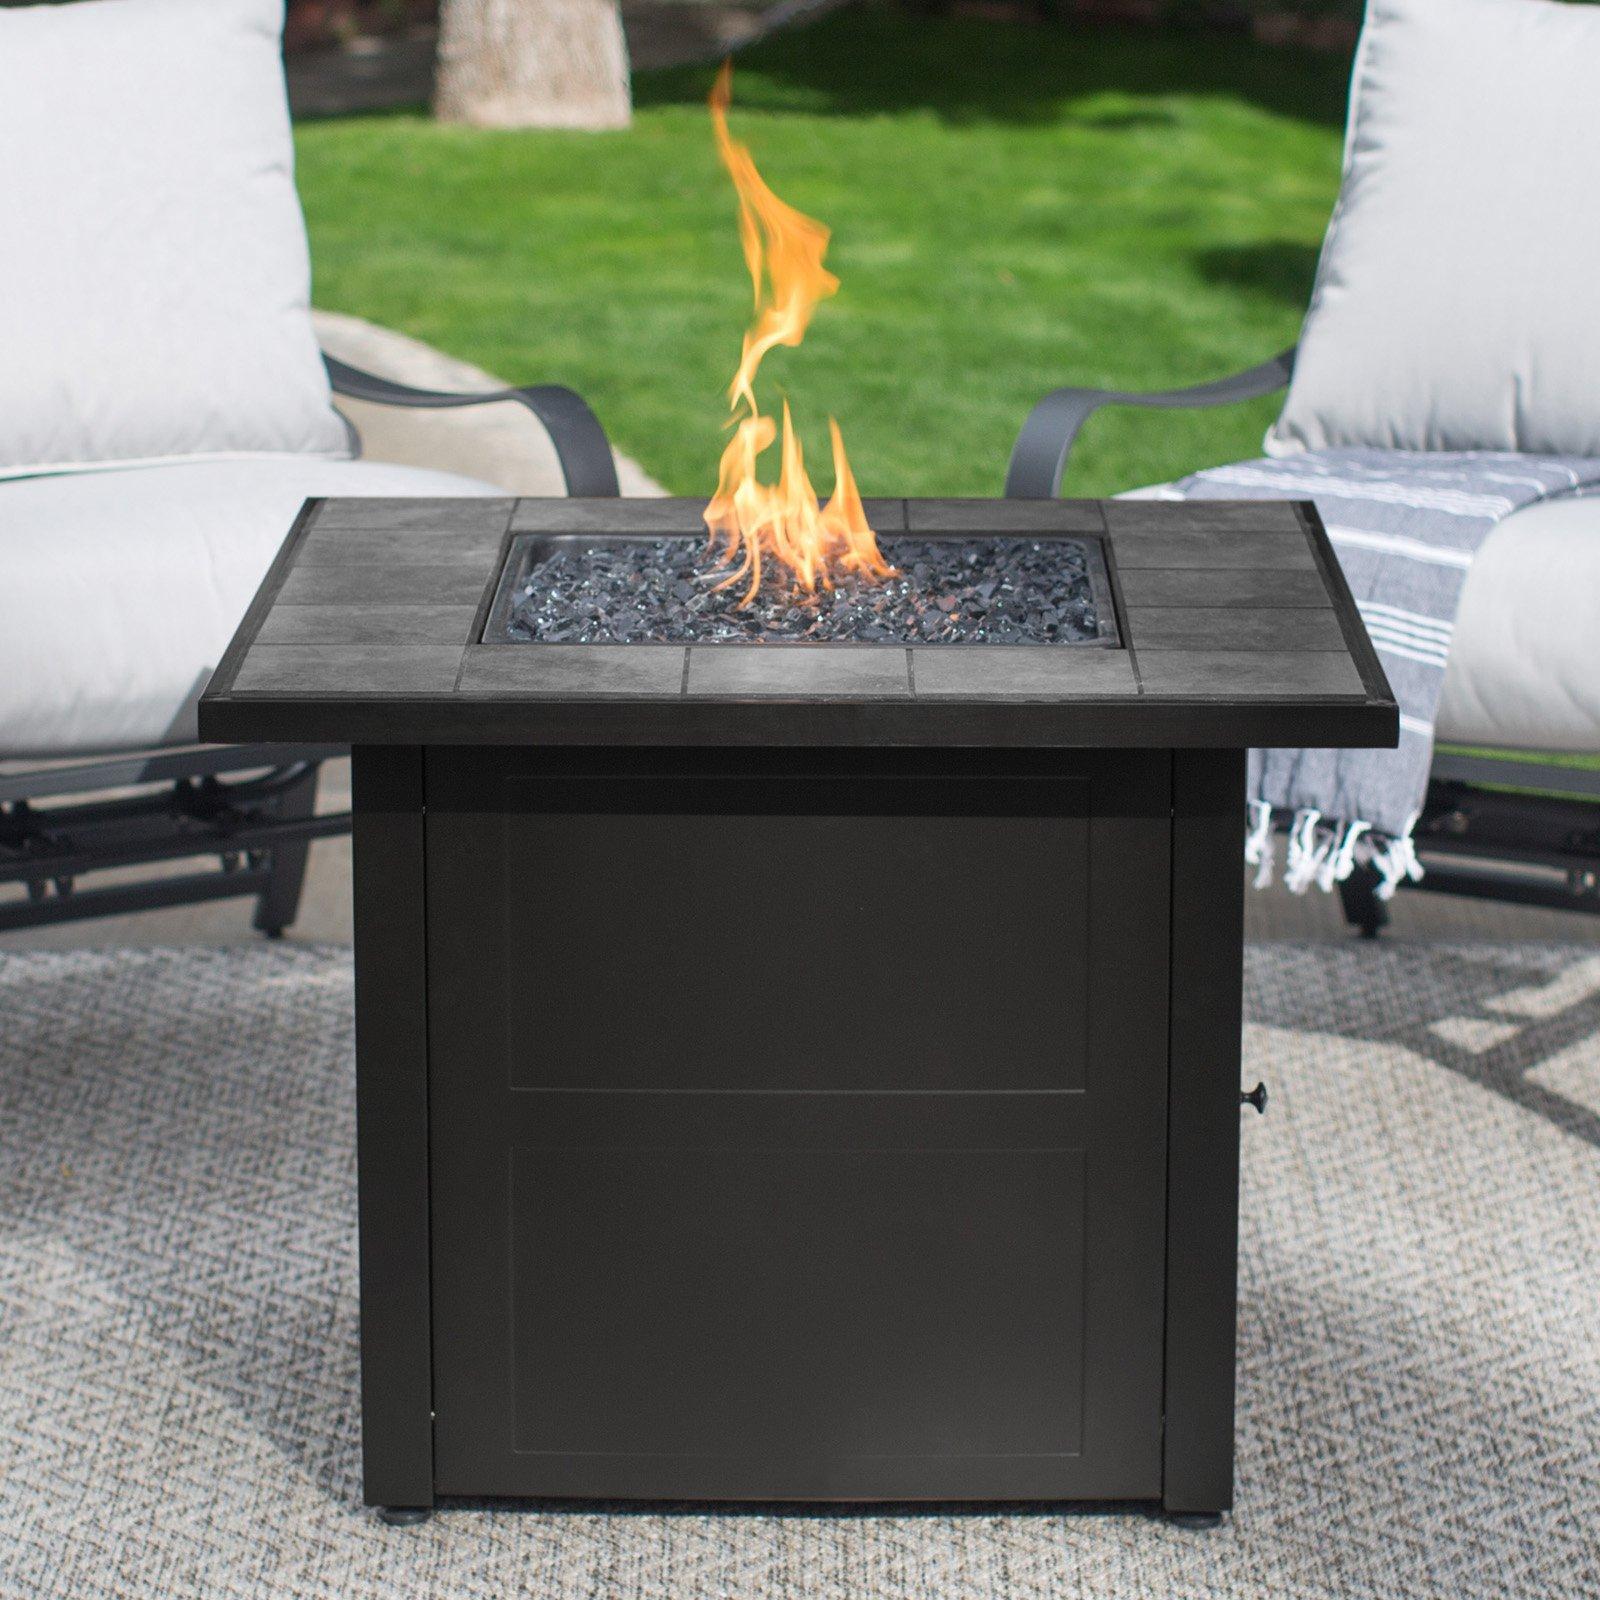 Outdoor Lp Gas Fire Bowl 105kaartenstempnl in dimensions 1600 X 1600